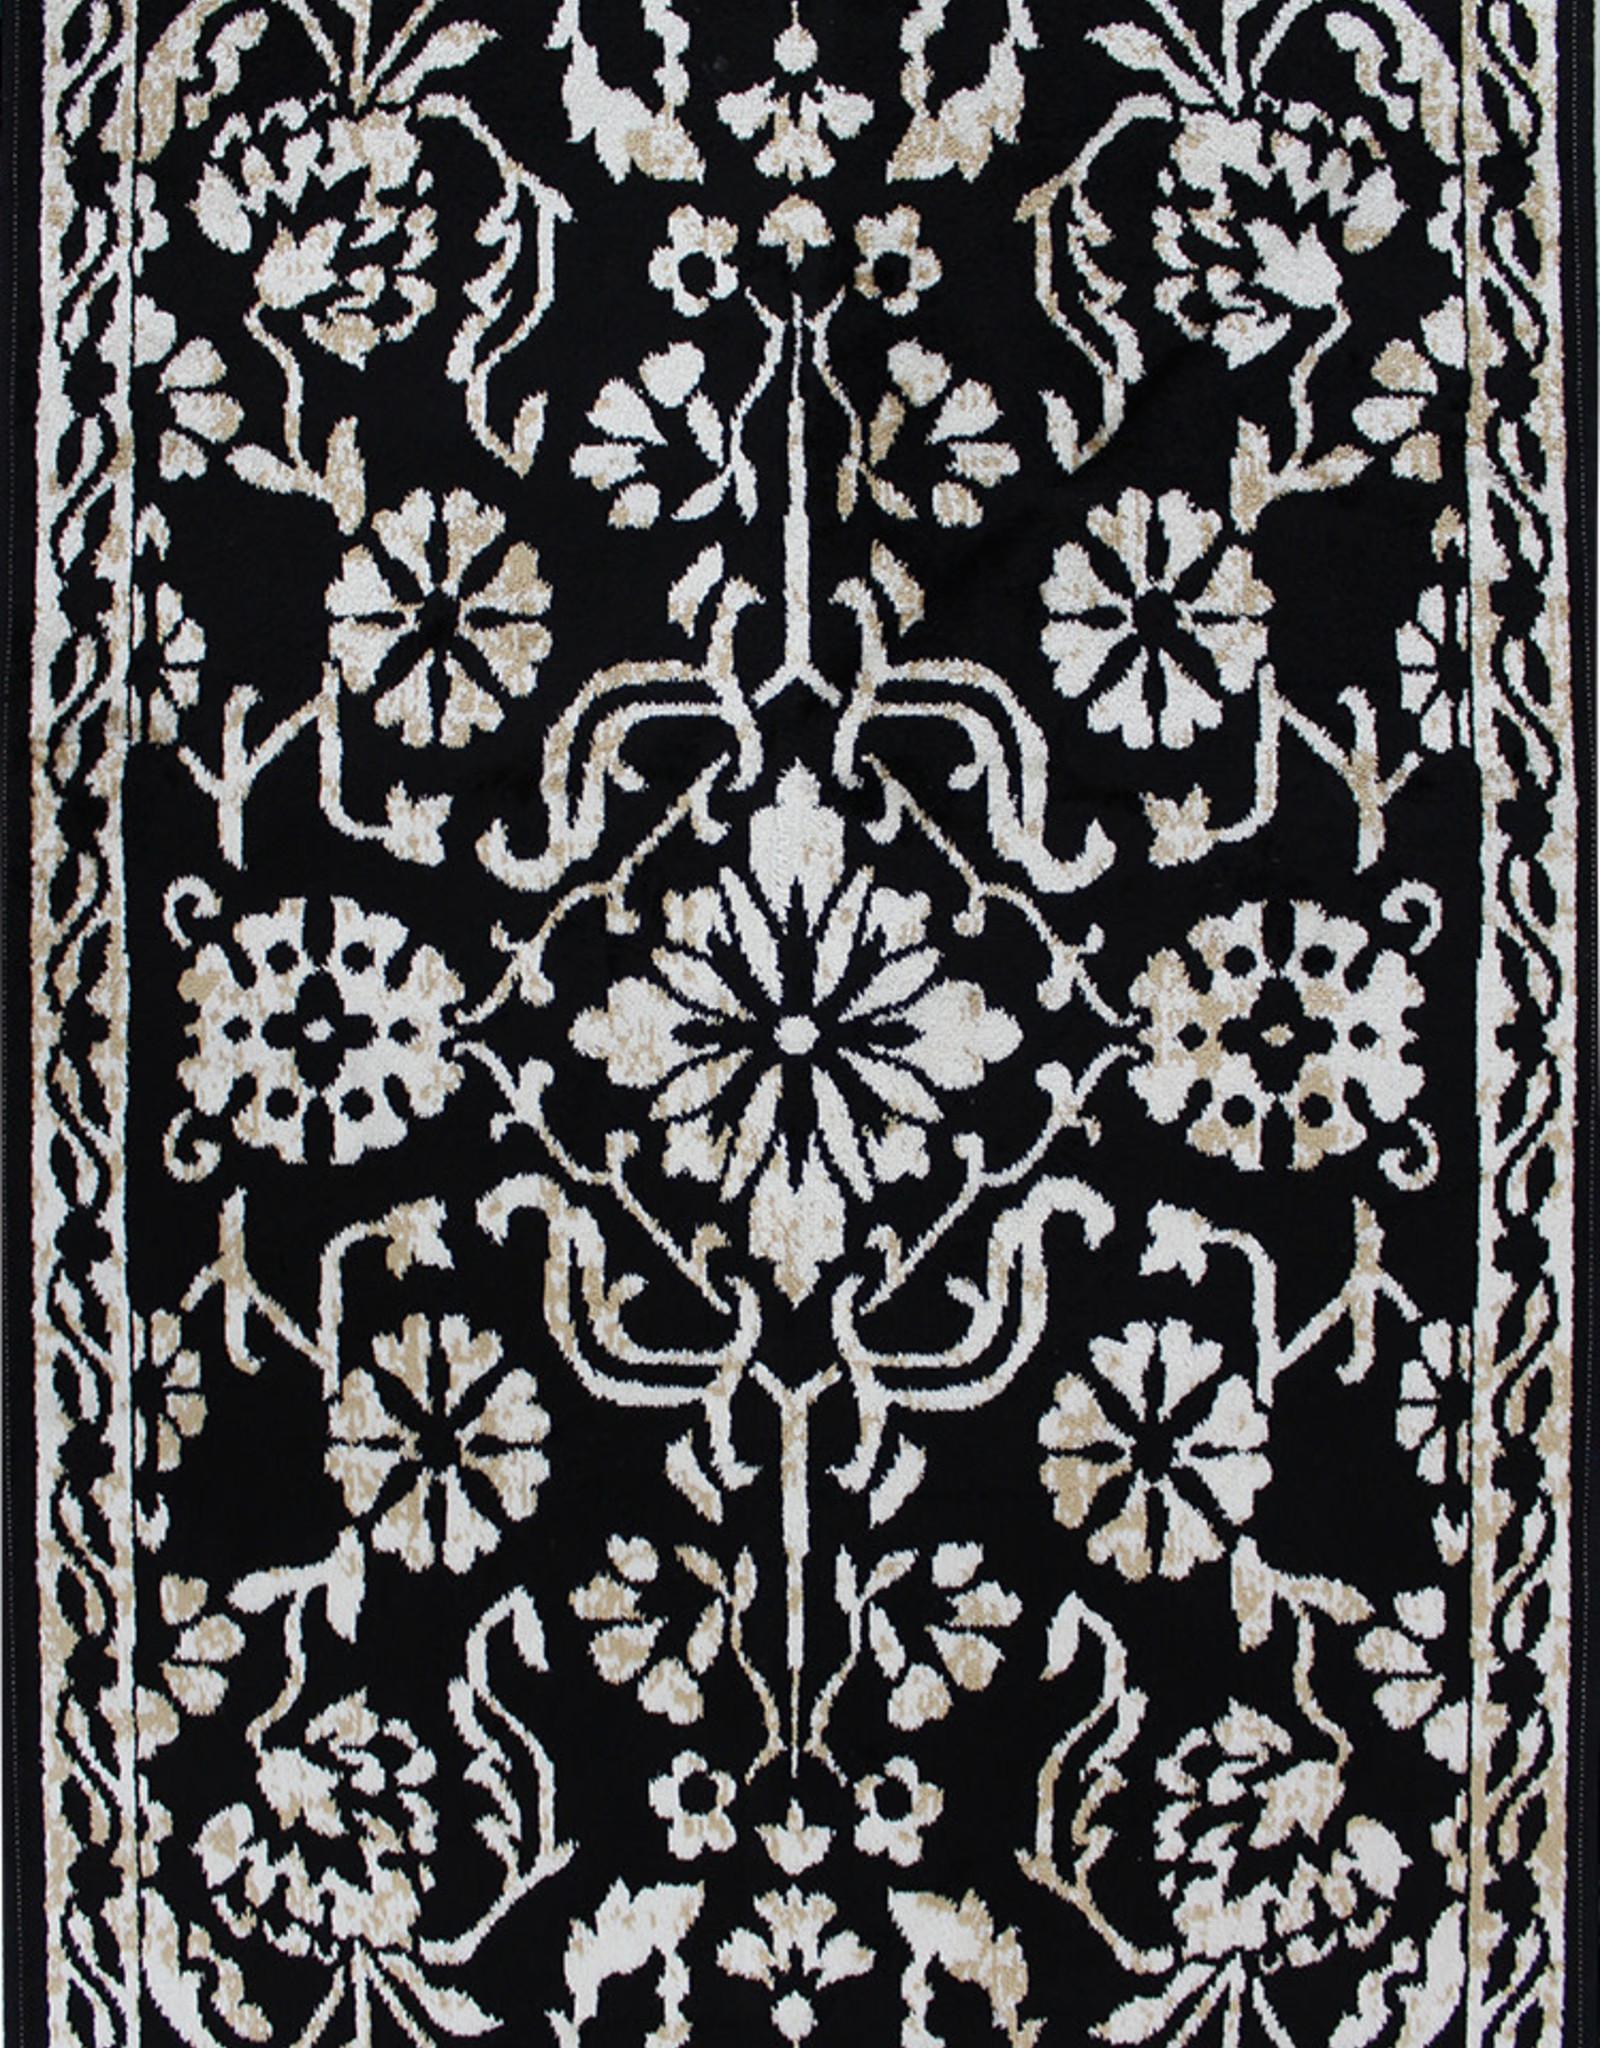 Rugs Avocado Artificial Silk 3'3 x 4'6 Naya Black